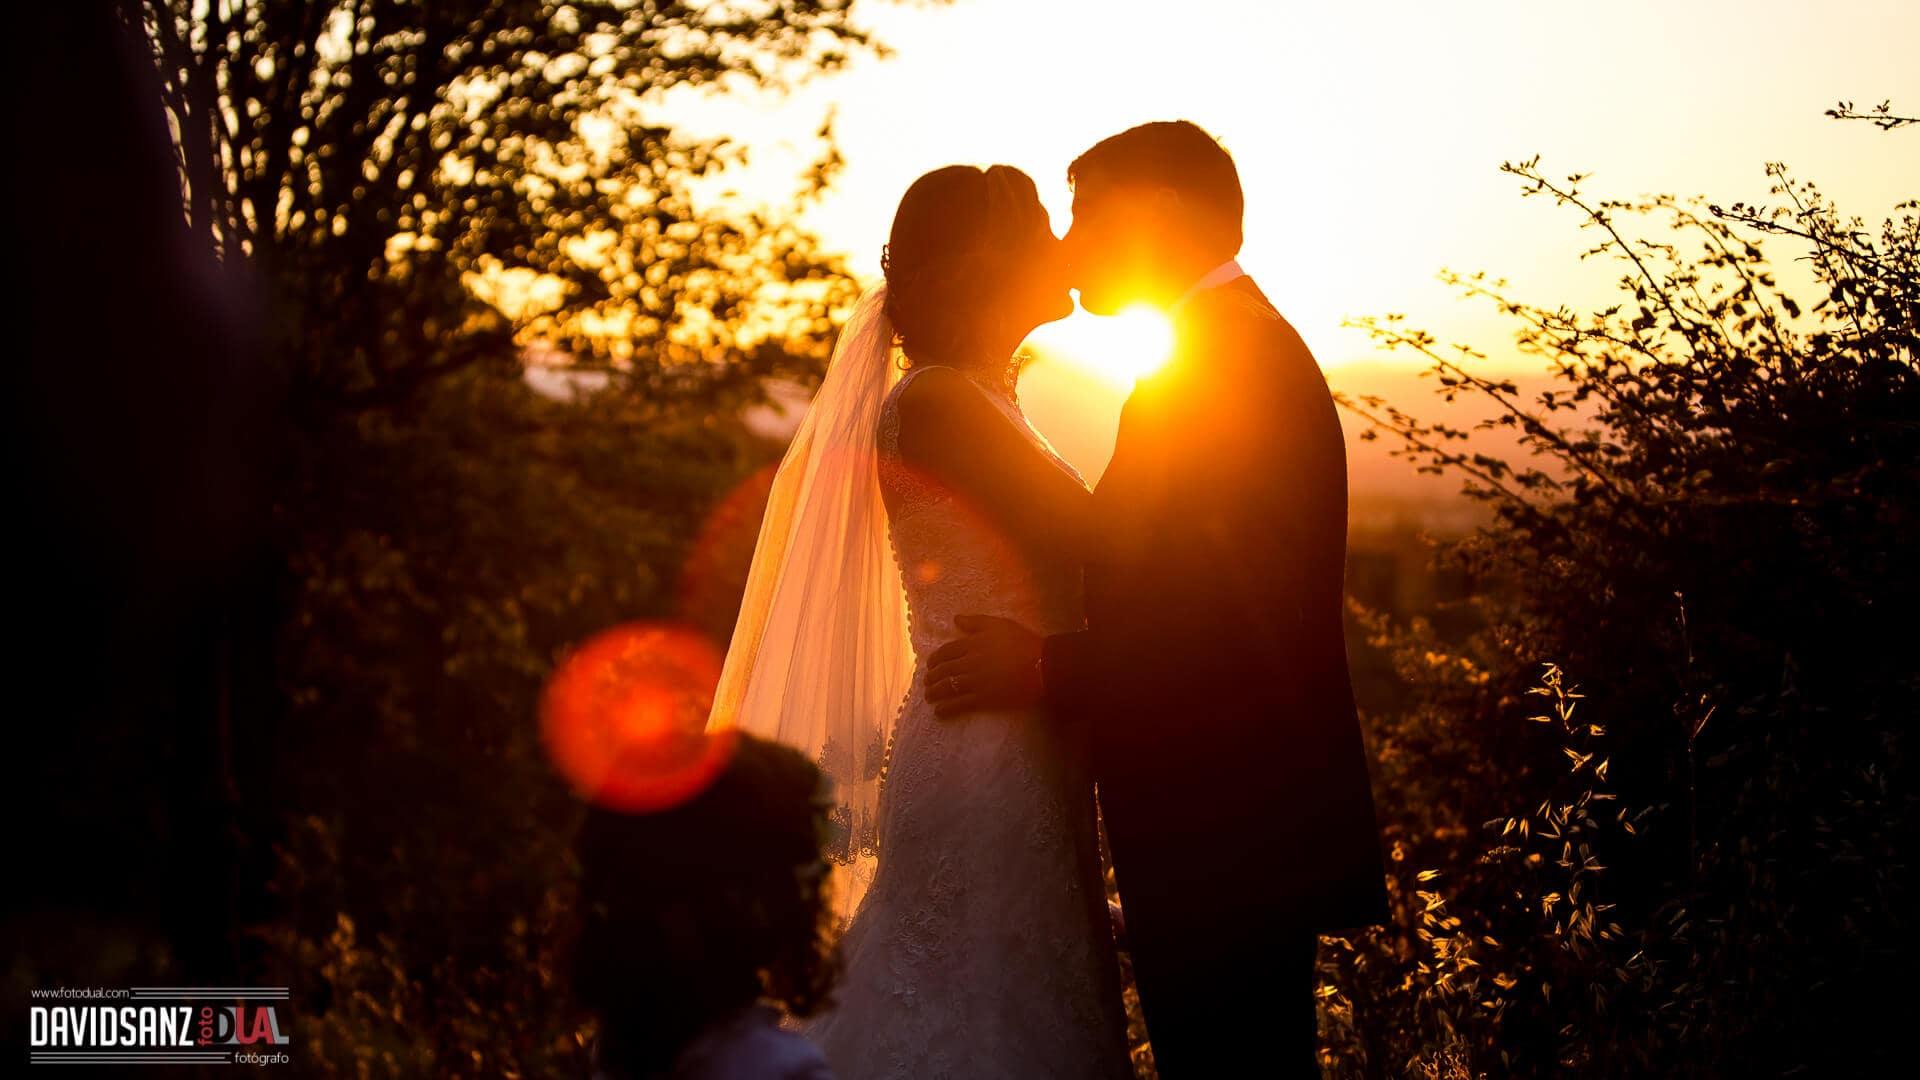 003-boda-badajoz-cañizos-cortijo-fotografo-de-bodas  castillo-piedrabuena-boda-badajoz-cristina-ismael-alcantara  1119elisabet_juanpablo  009-boda-badajoz-cañizos-cortijo-fotografo-de-bodas  009-valencia-alcantara-boda-san-pedro-convento-fotografo-bodas  fotografos-boda-lisboa-portugal-2  019-boda-badajoz-cañizos-cortijo-fotografo-de-bodas  premio-internacional-fotografo-bodas-fotografo-badajoz-caceres-madrid-merida-spain  008-boda-badajoz-cañizos-cortijo-fotografo-de-bodas  008-boda-valencia-alcantara-convento-merida-caceres  boda-alburquerque-castillo-juany-lucas-11  boda-alburquerque-castillo-luna-12